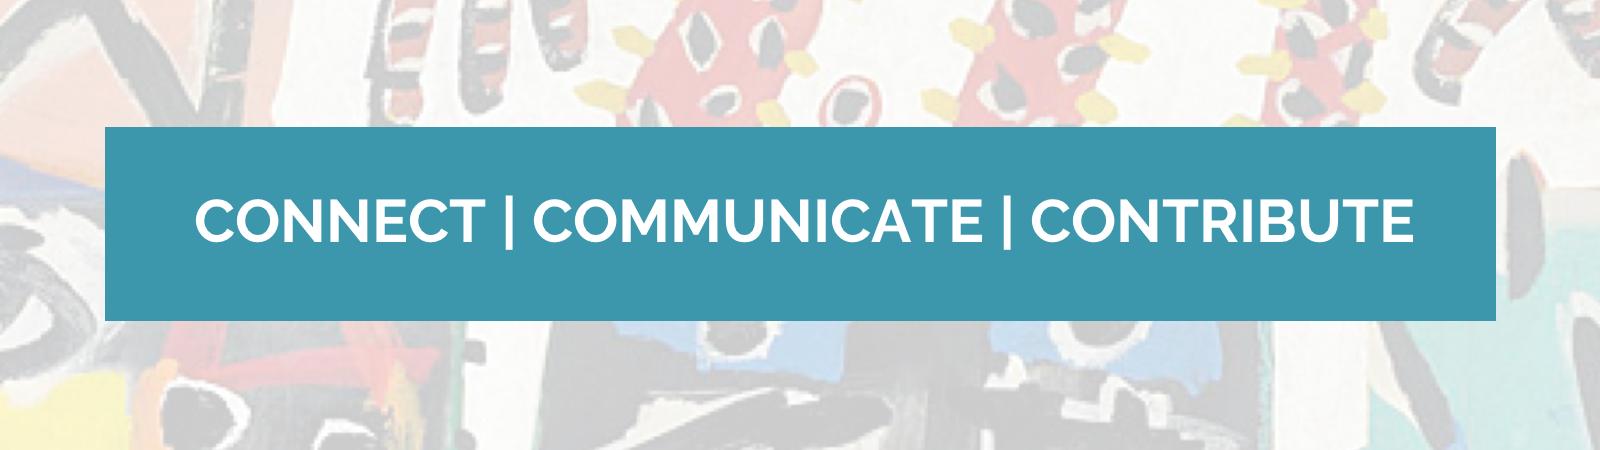 Connect Communicate Contribute